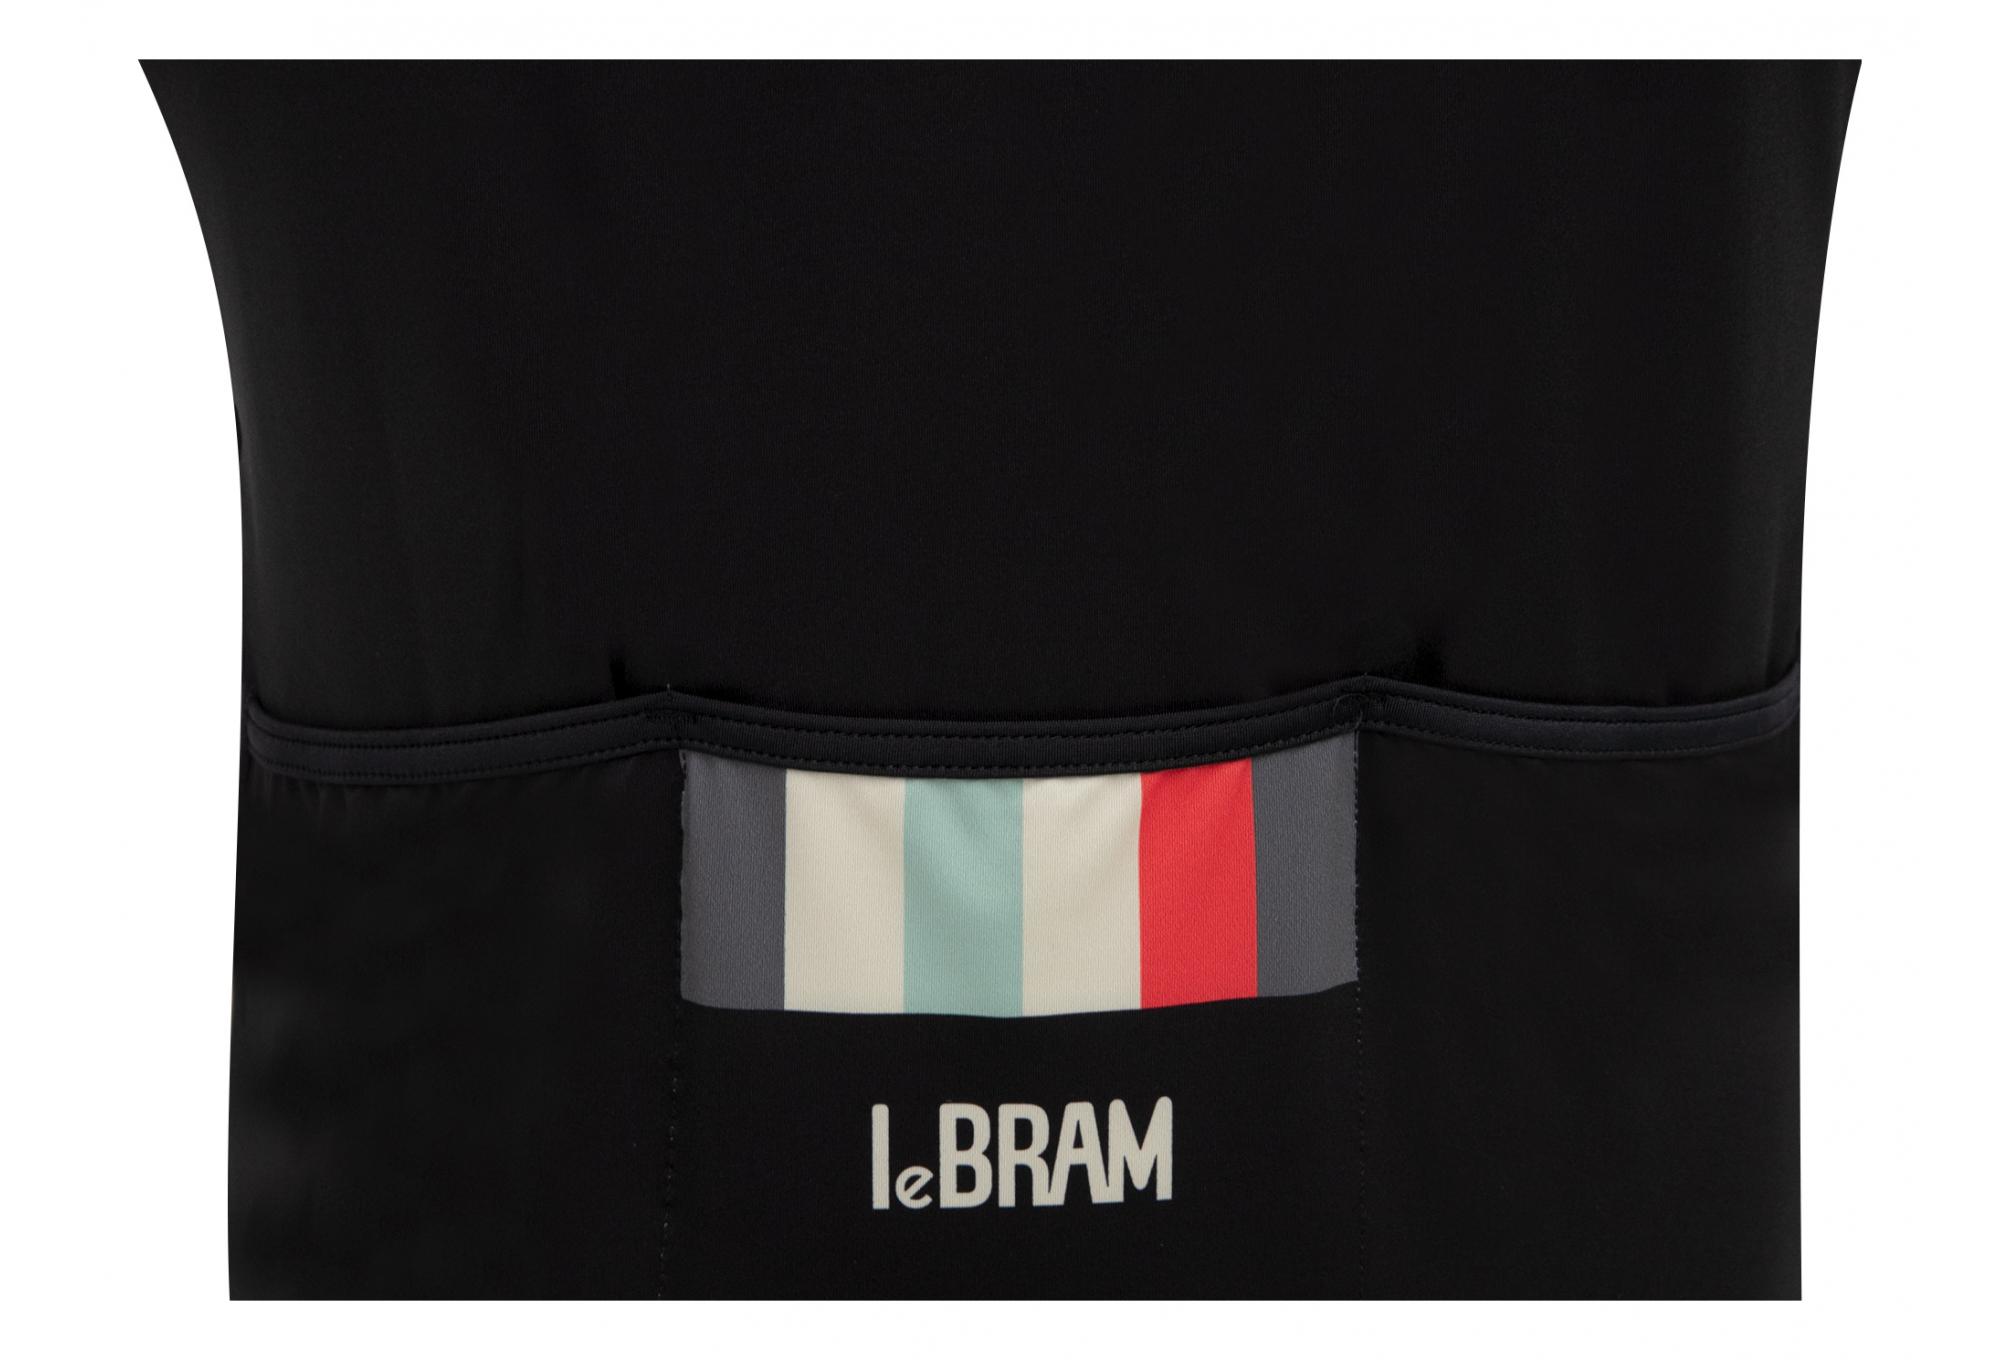 202007_LEBRAM_AUBISQUE_NOIR_GRIS_5